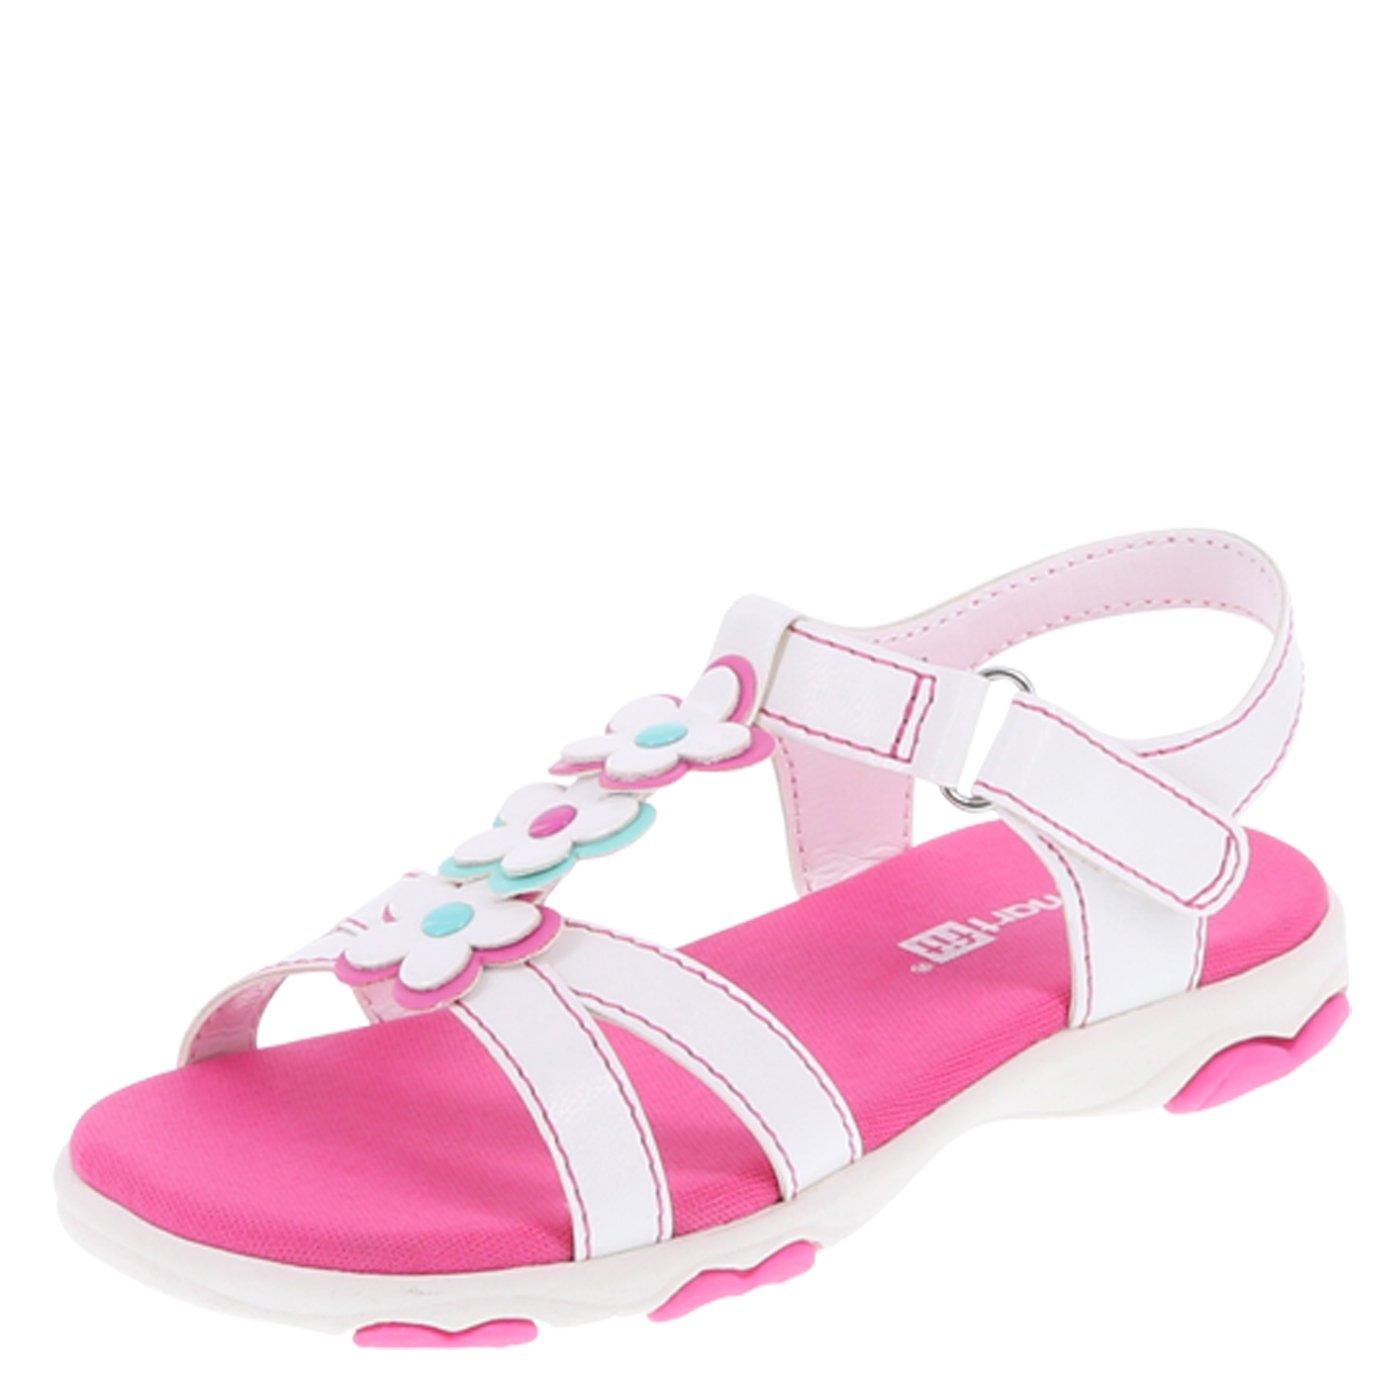 SmartFit Girls' Chase Flower Play Sandal 078233-Parent